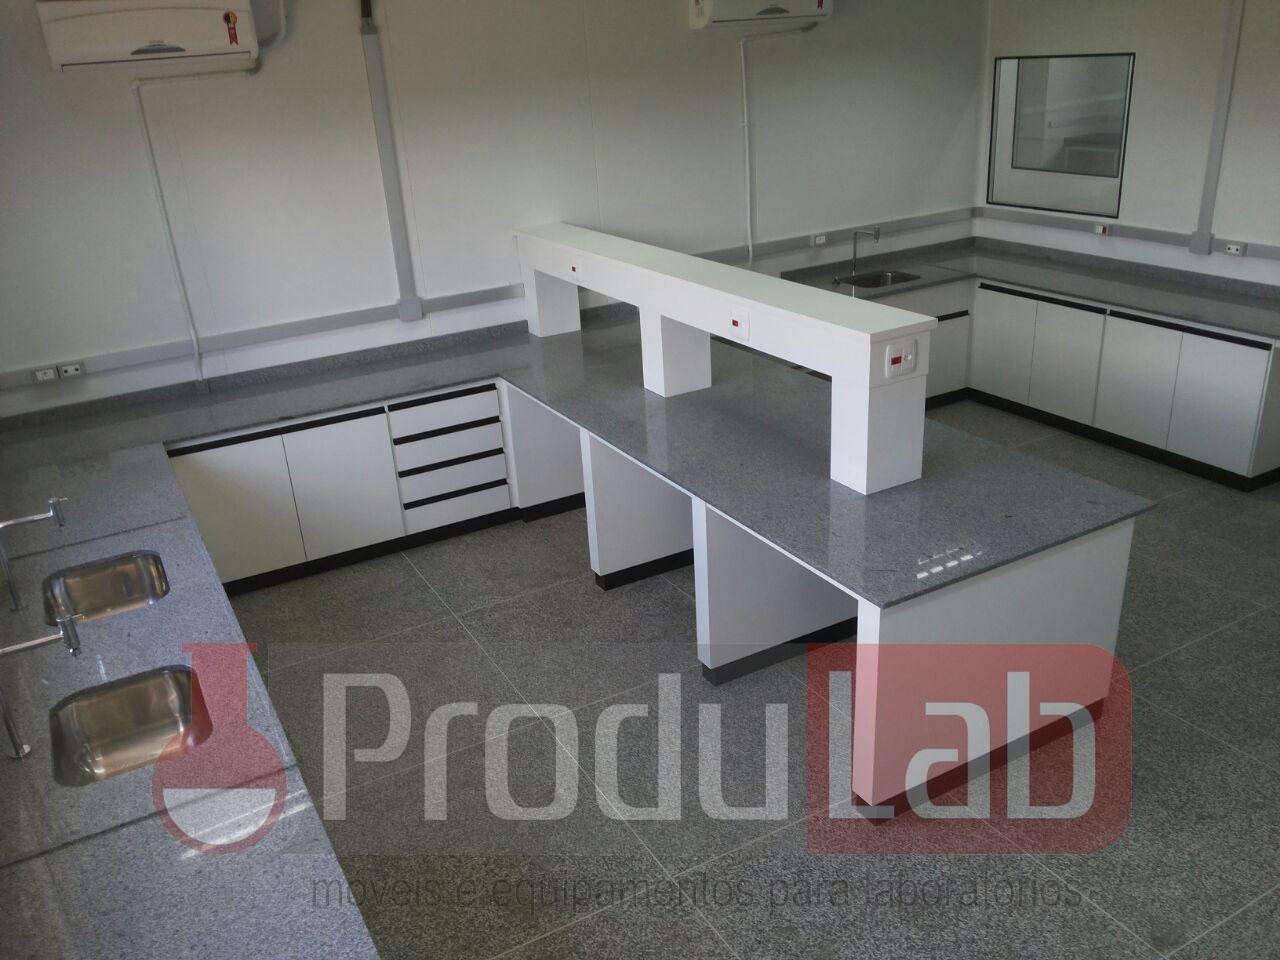 produlab-foto-portfolio34